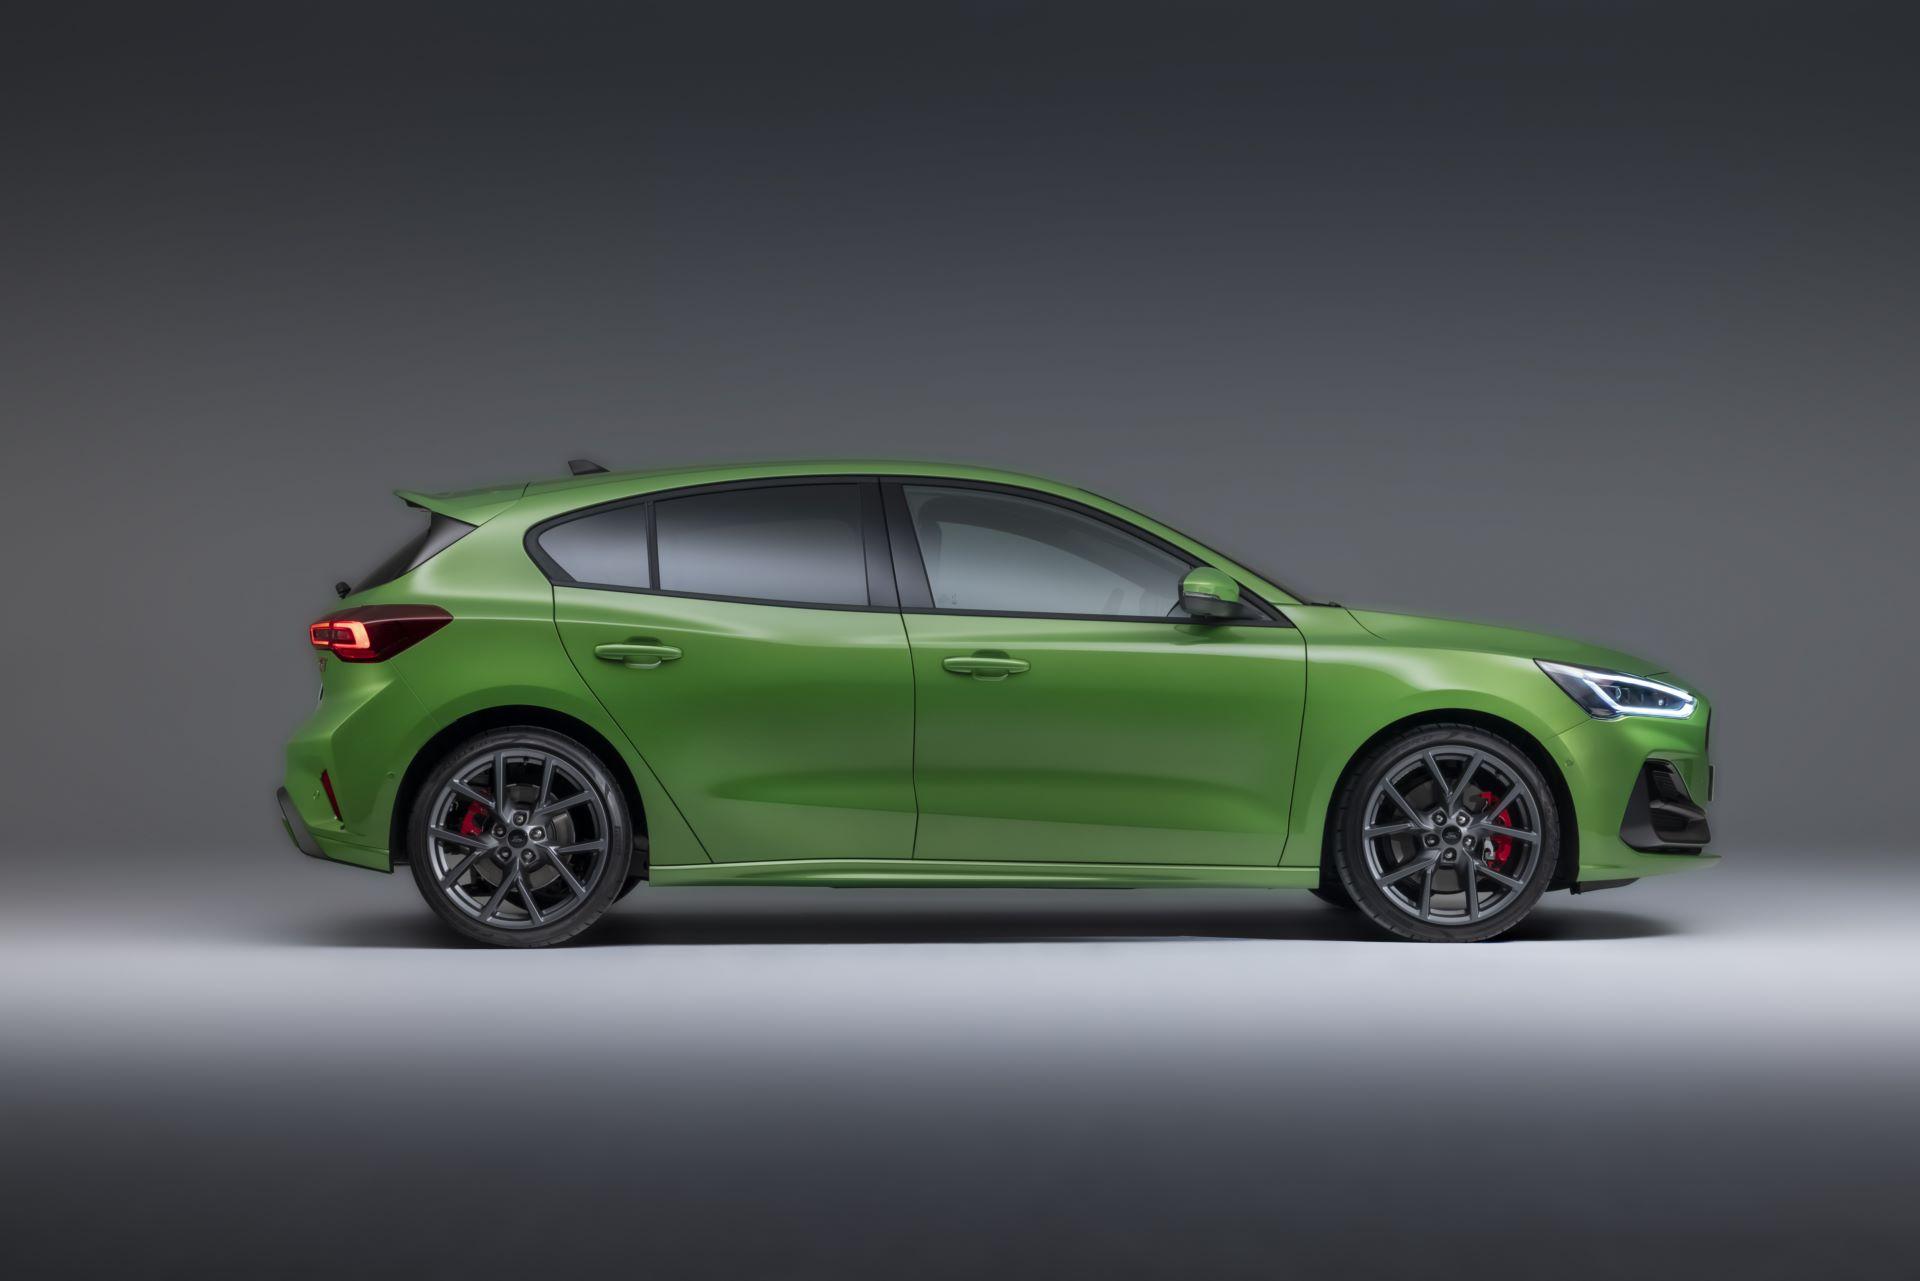 Ford-Focus-ST-facelift-2021-3